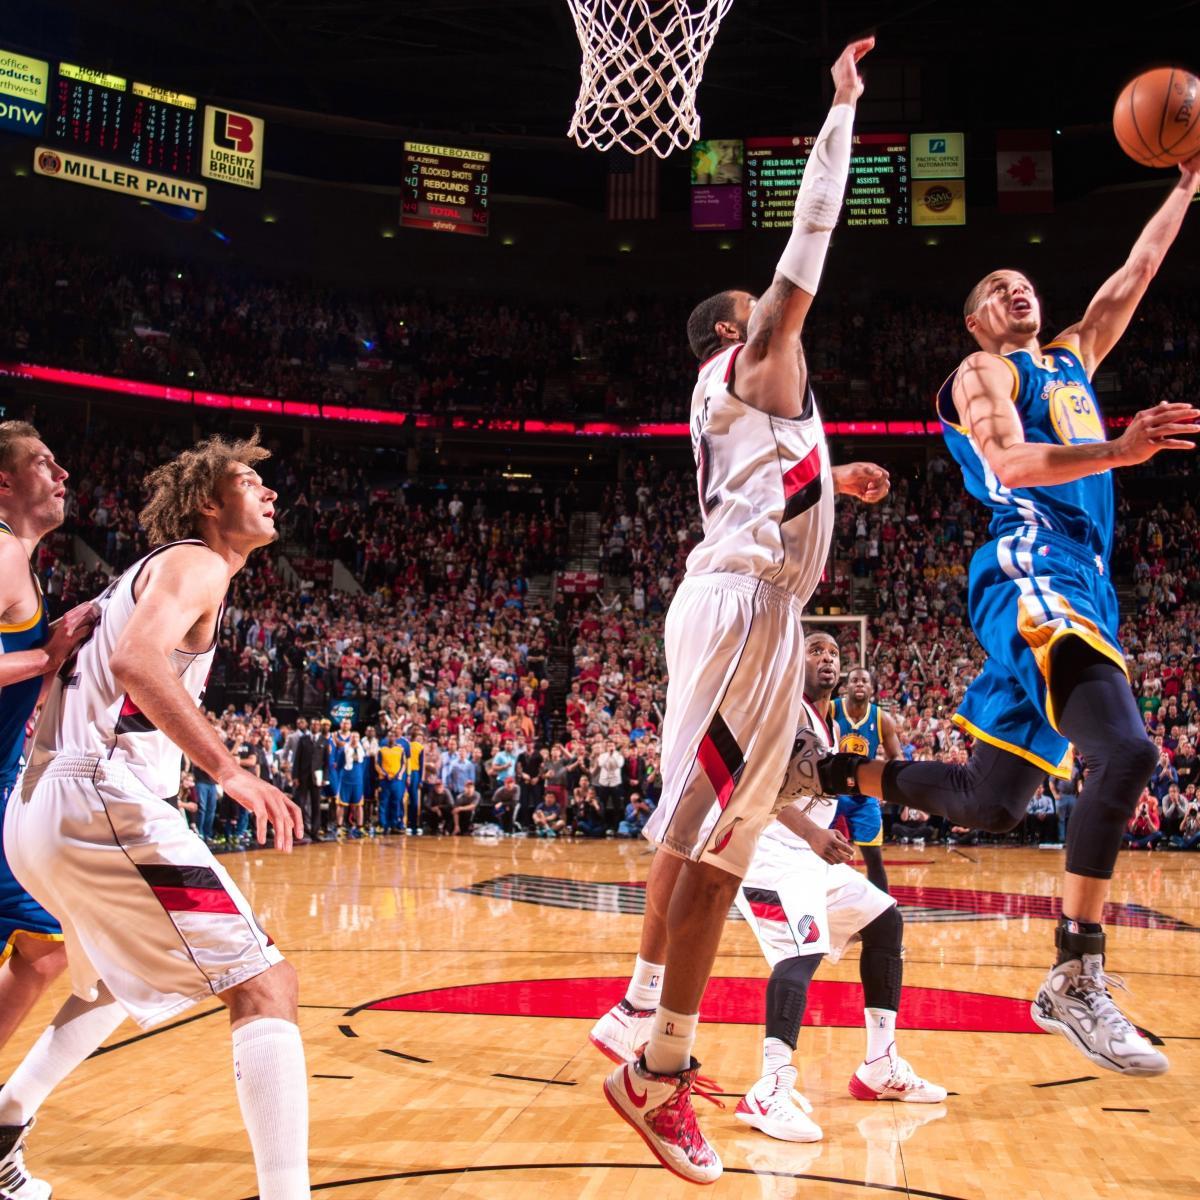 Warriors Movie Clips: Golden State Warriors Vs Portland Trail Blazers 4/13/14